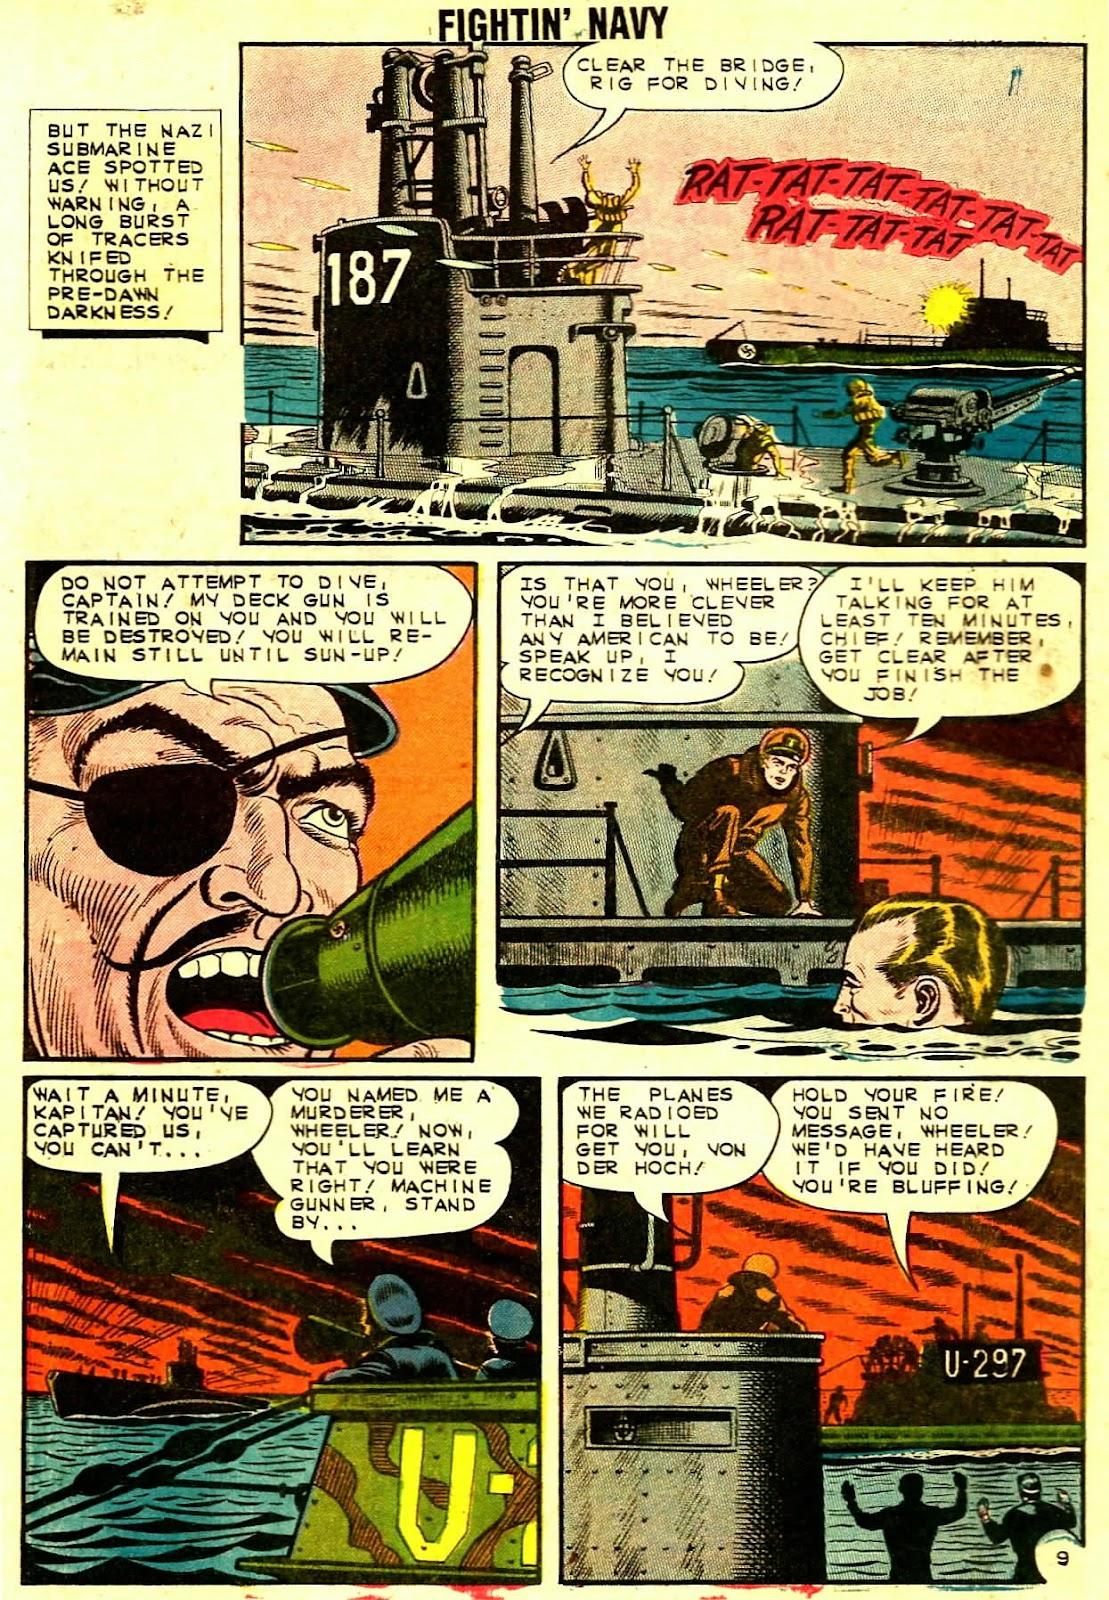 Read online Fightin' Navy comic -  Issue #109 - 32